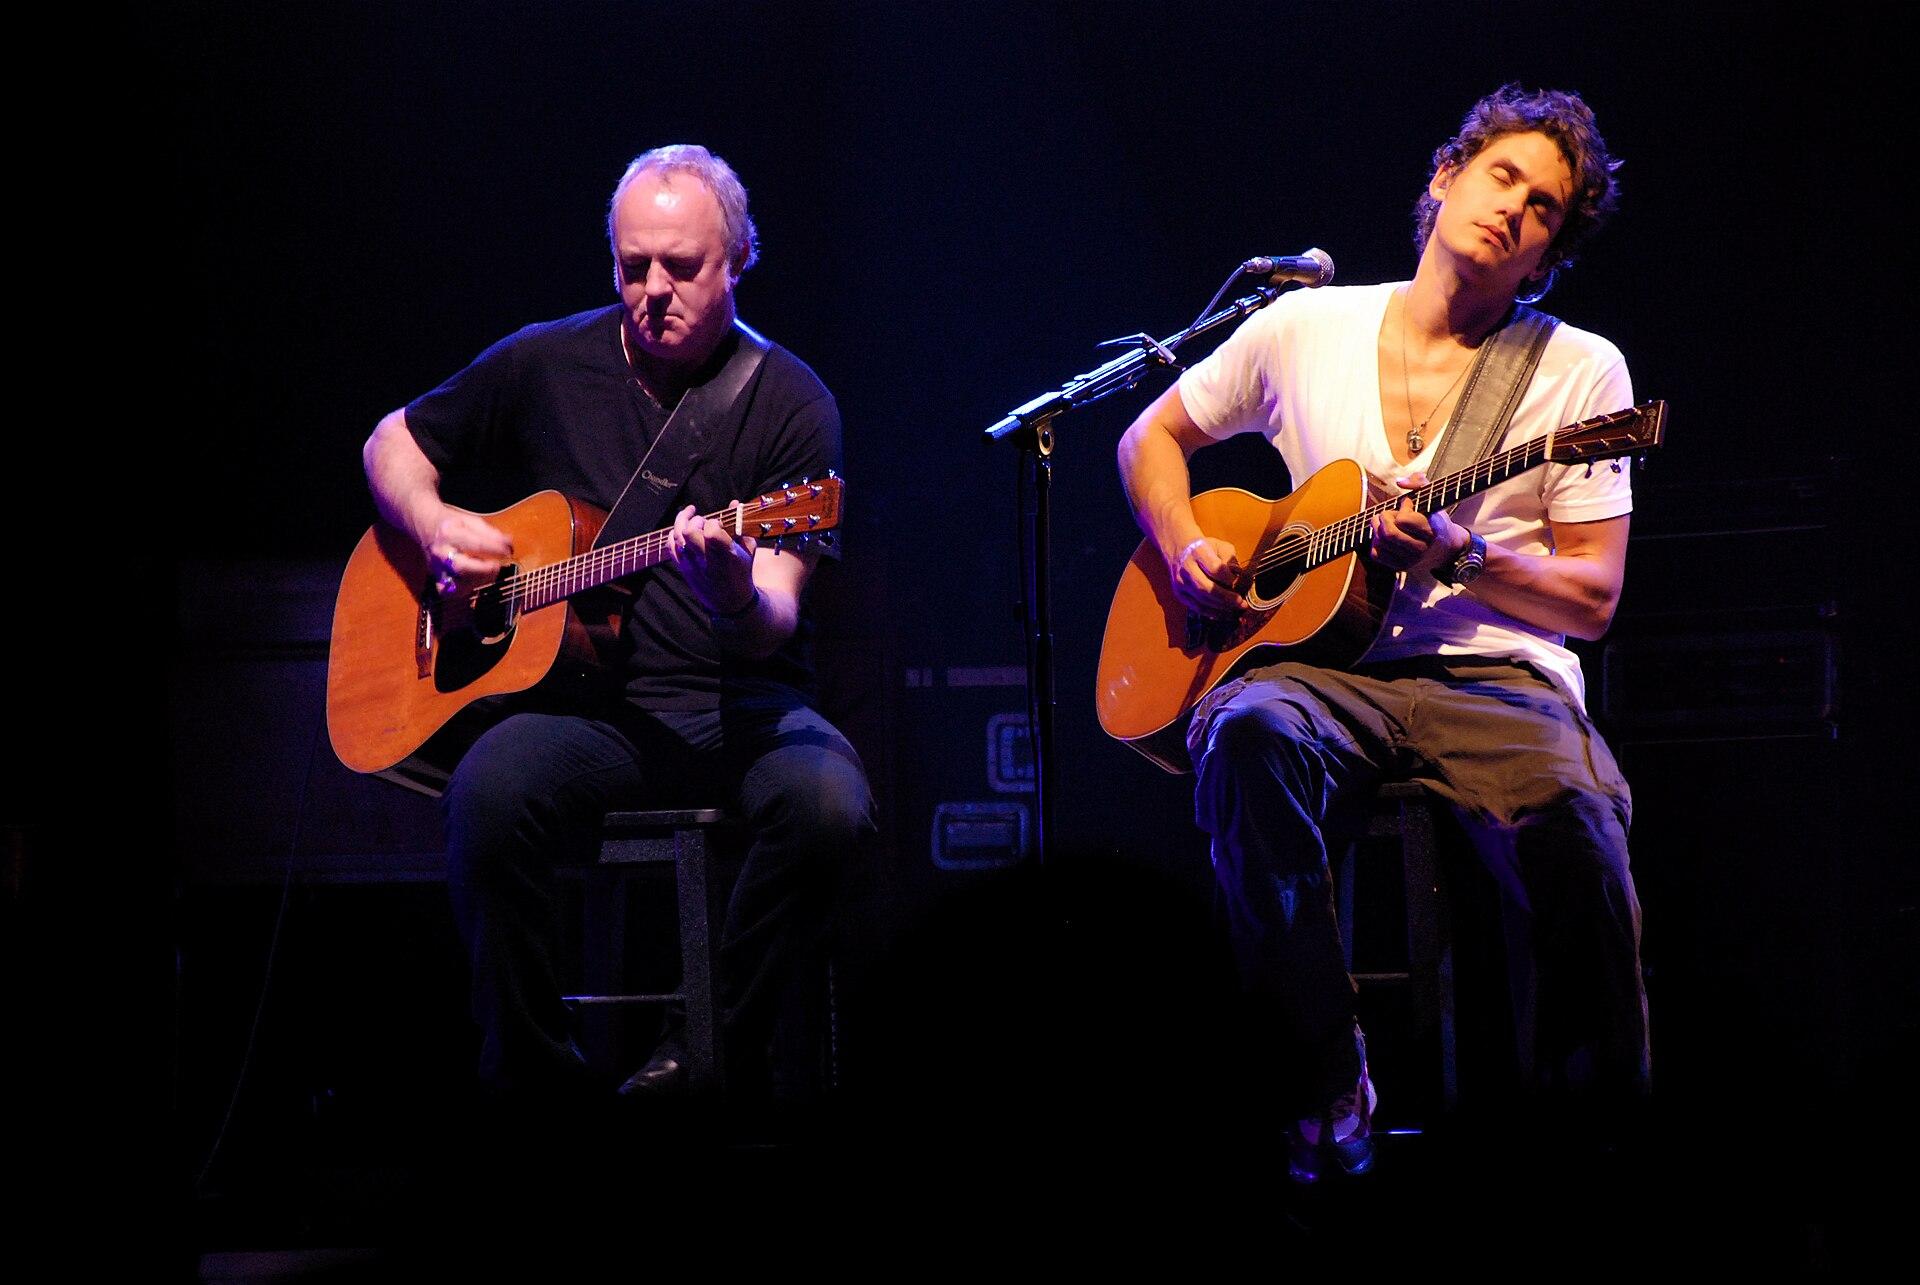 John Mayer Tour Setlist